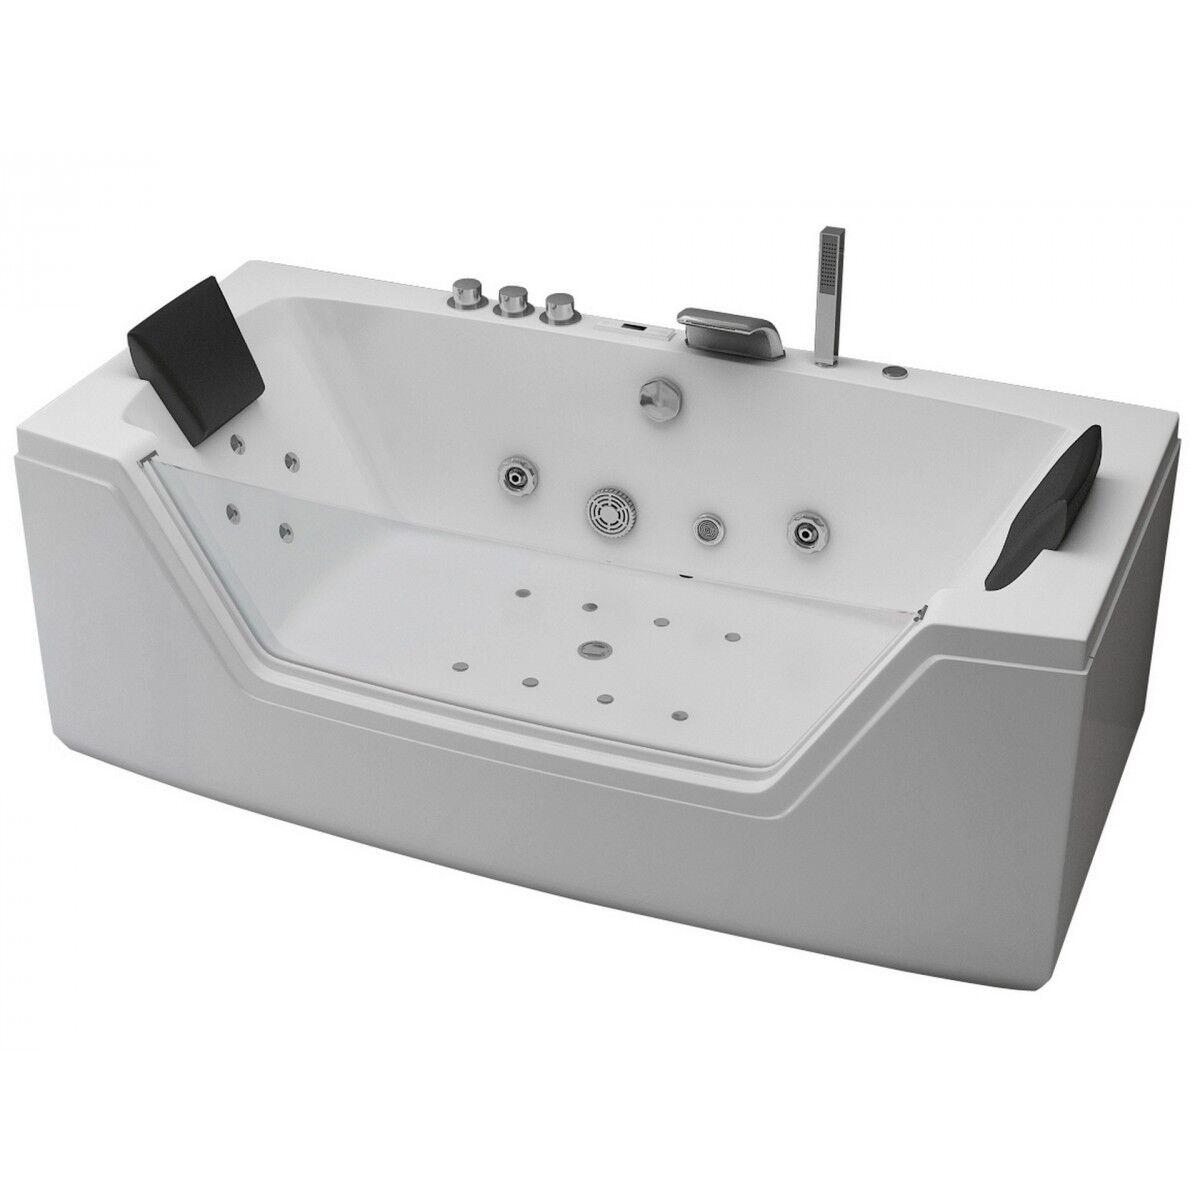 Spatec Vasche idromassaggio Vitro 160